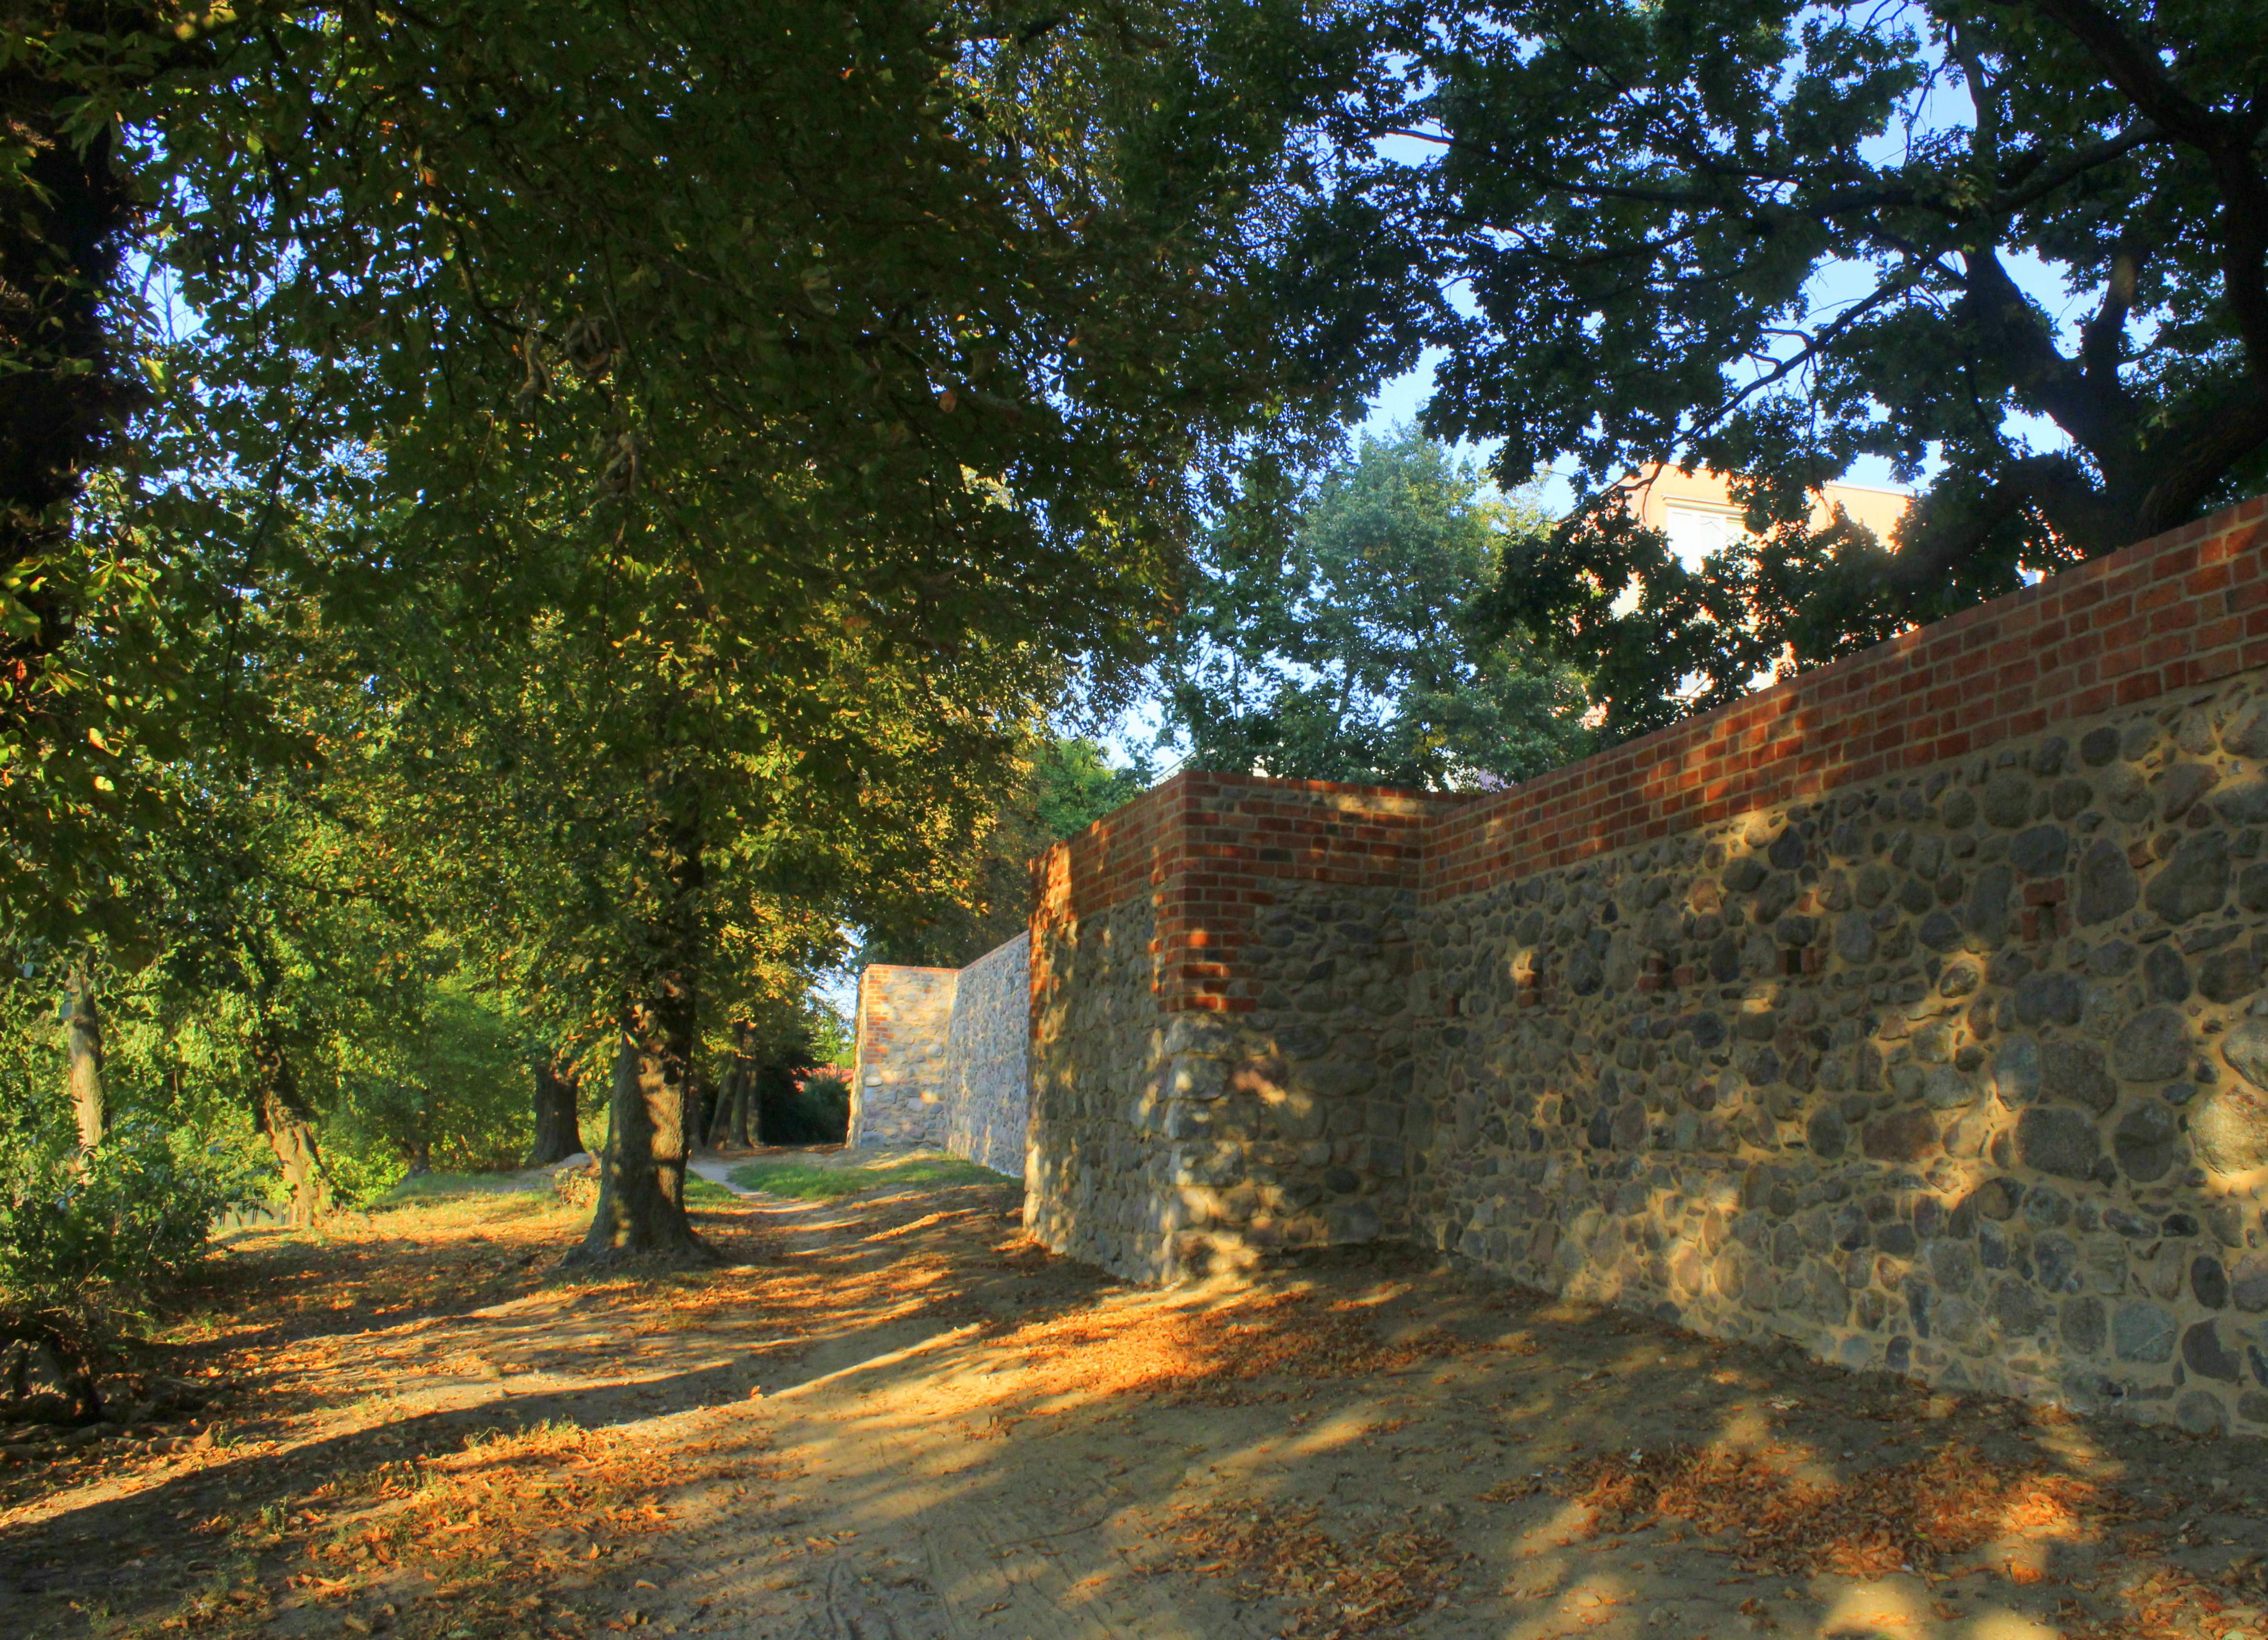 Stadtmauer, Myślibórz (Soldin)